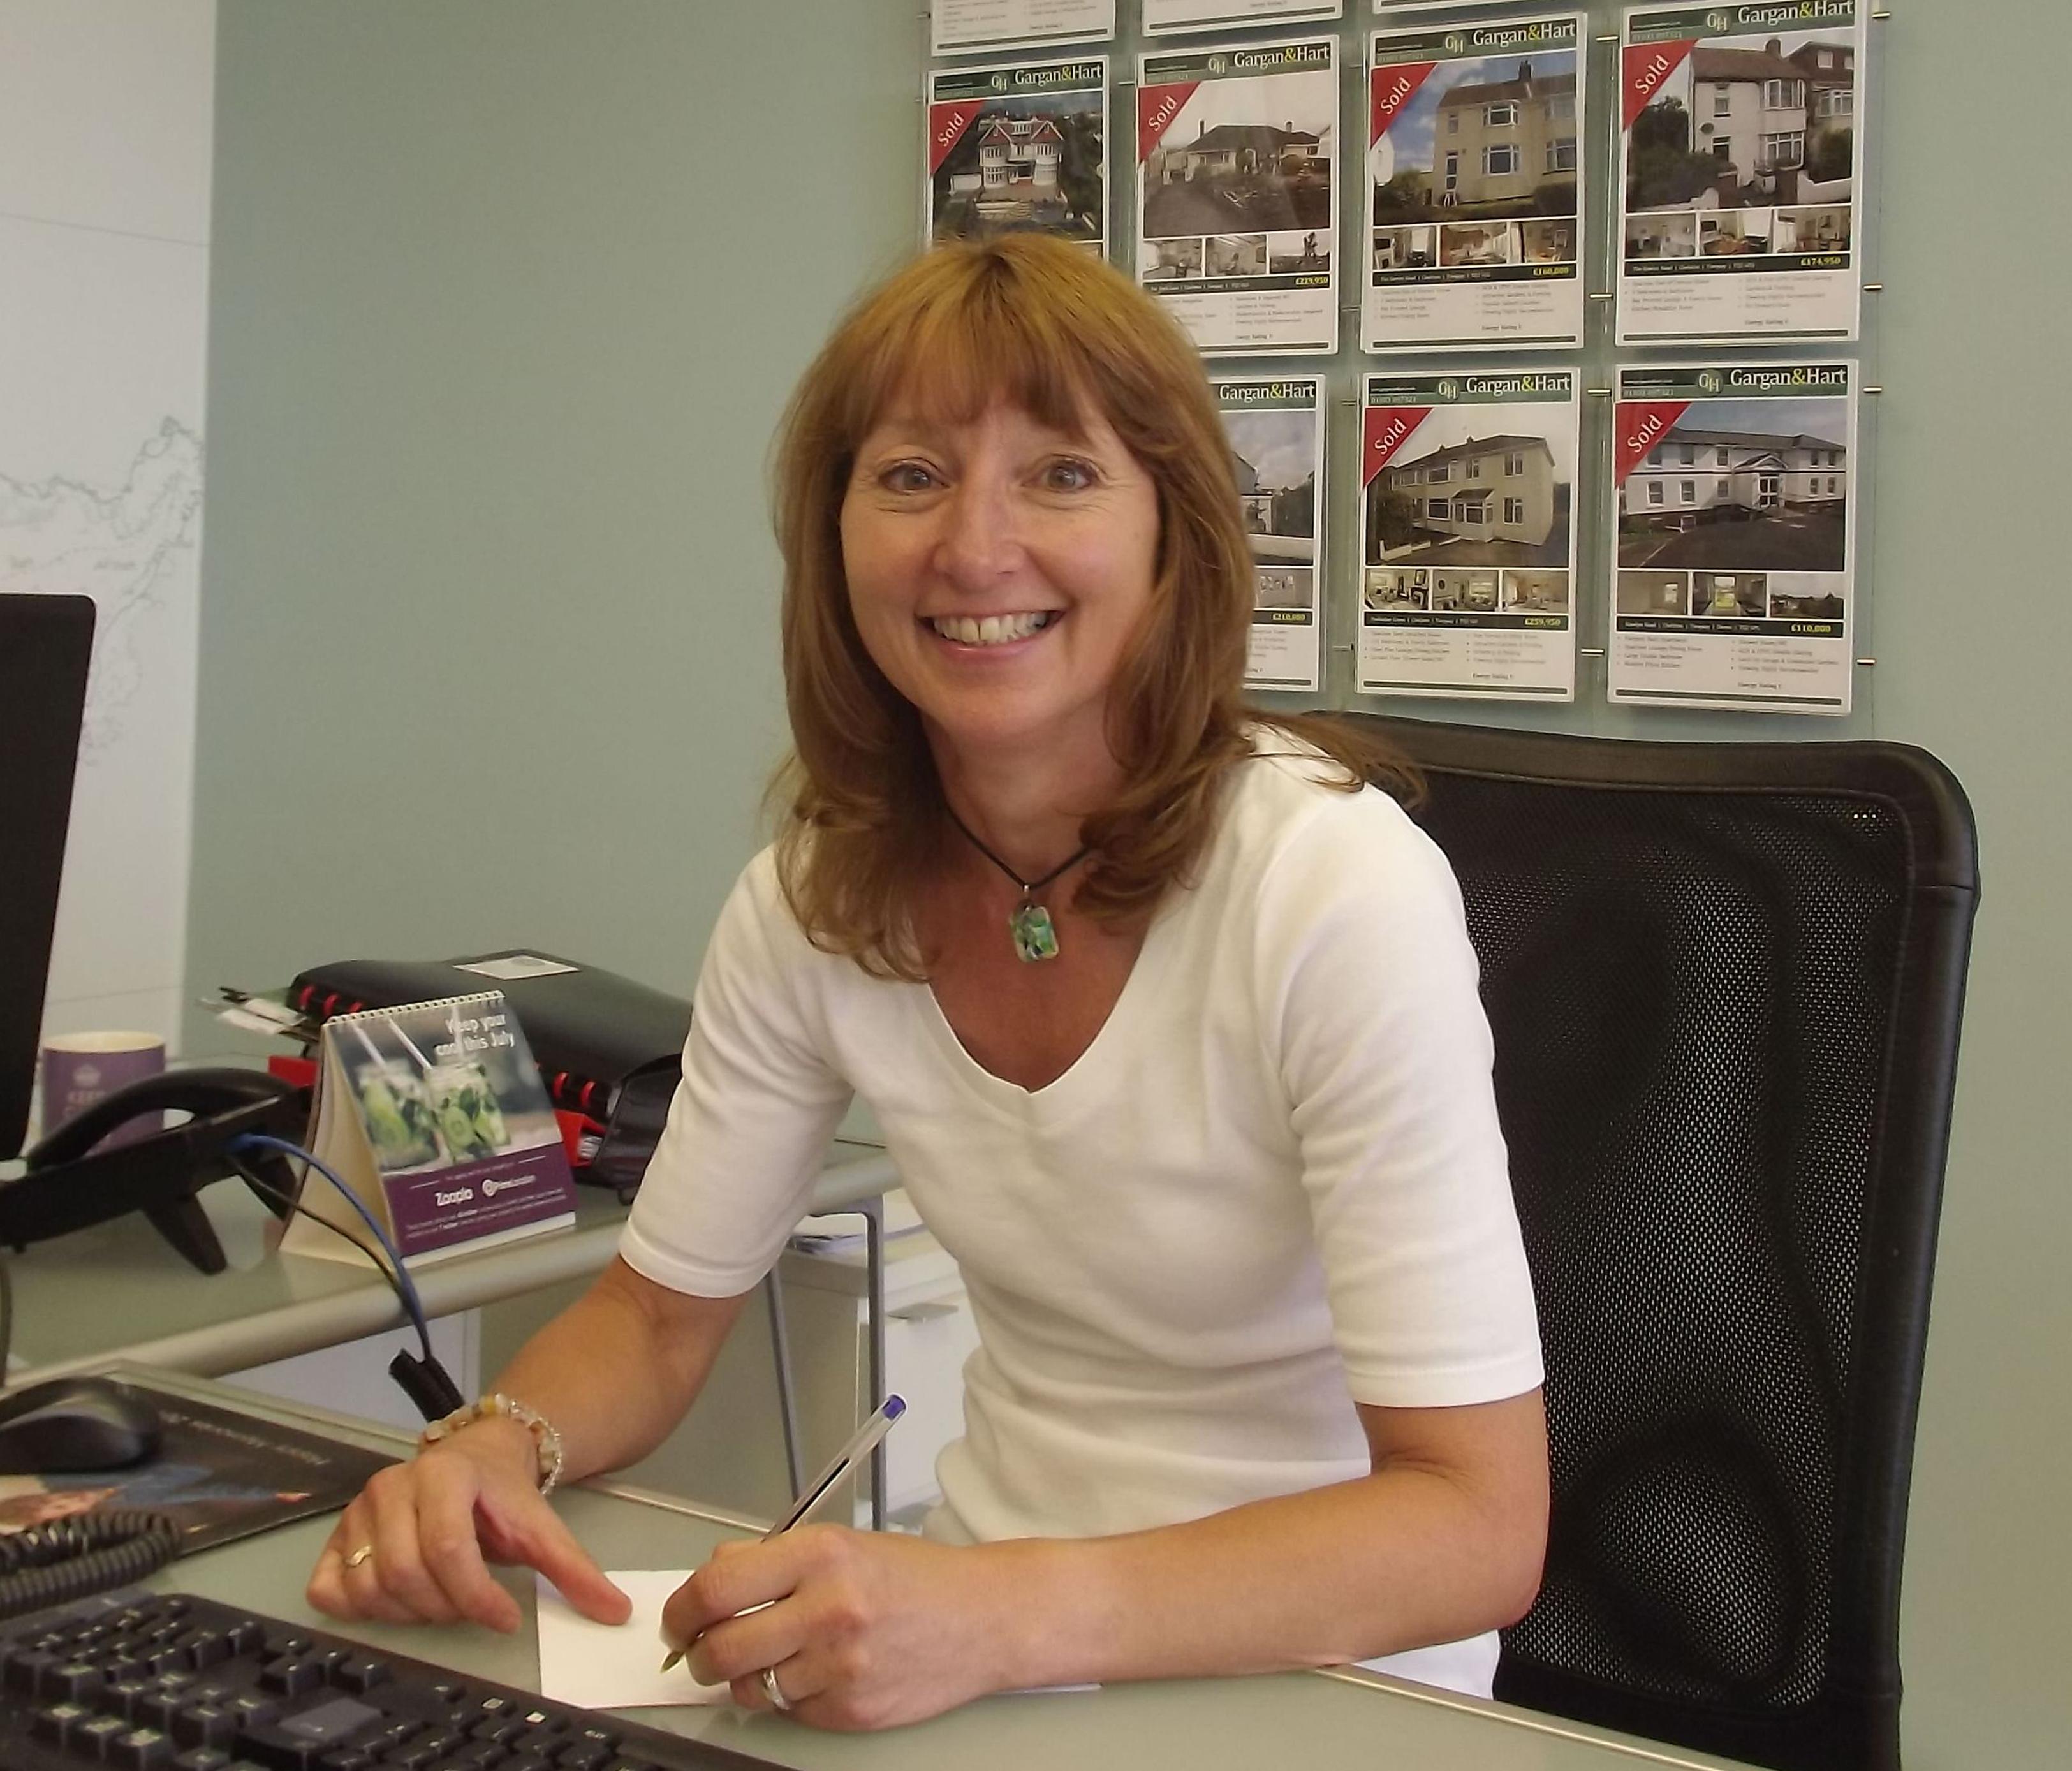 Cathy Parkinson